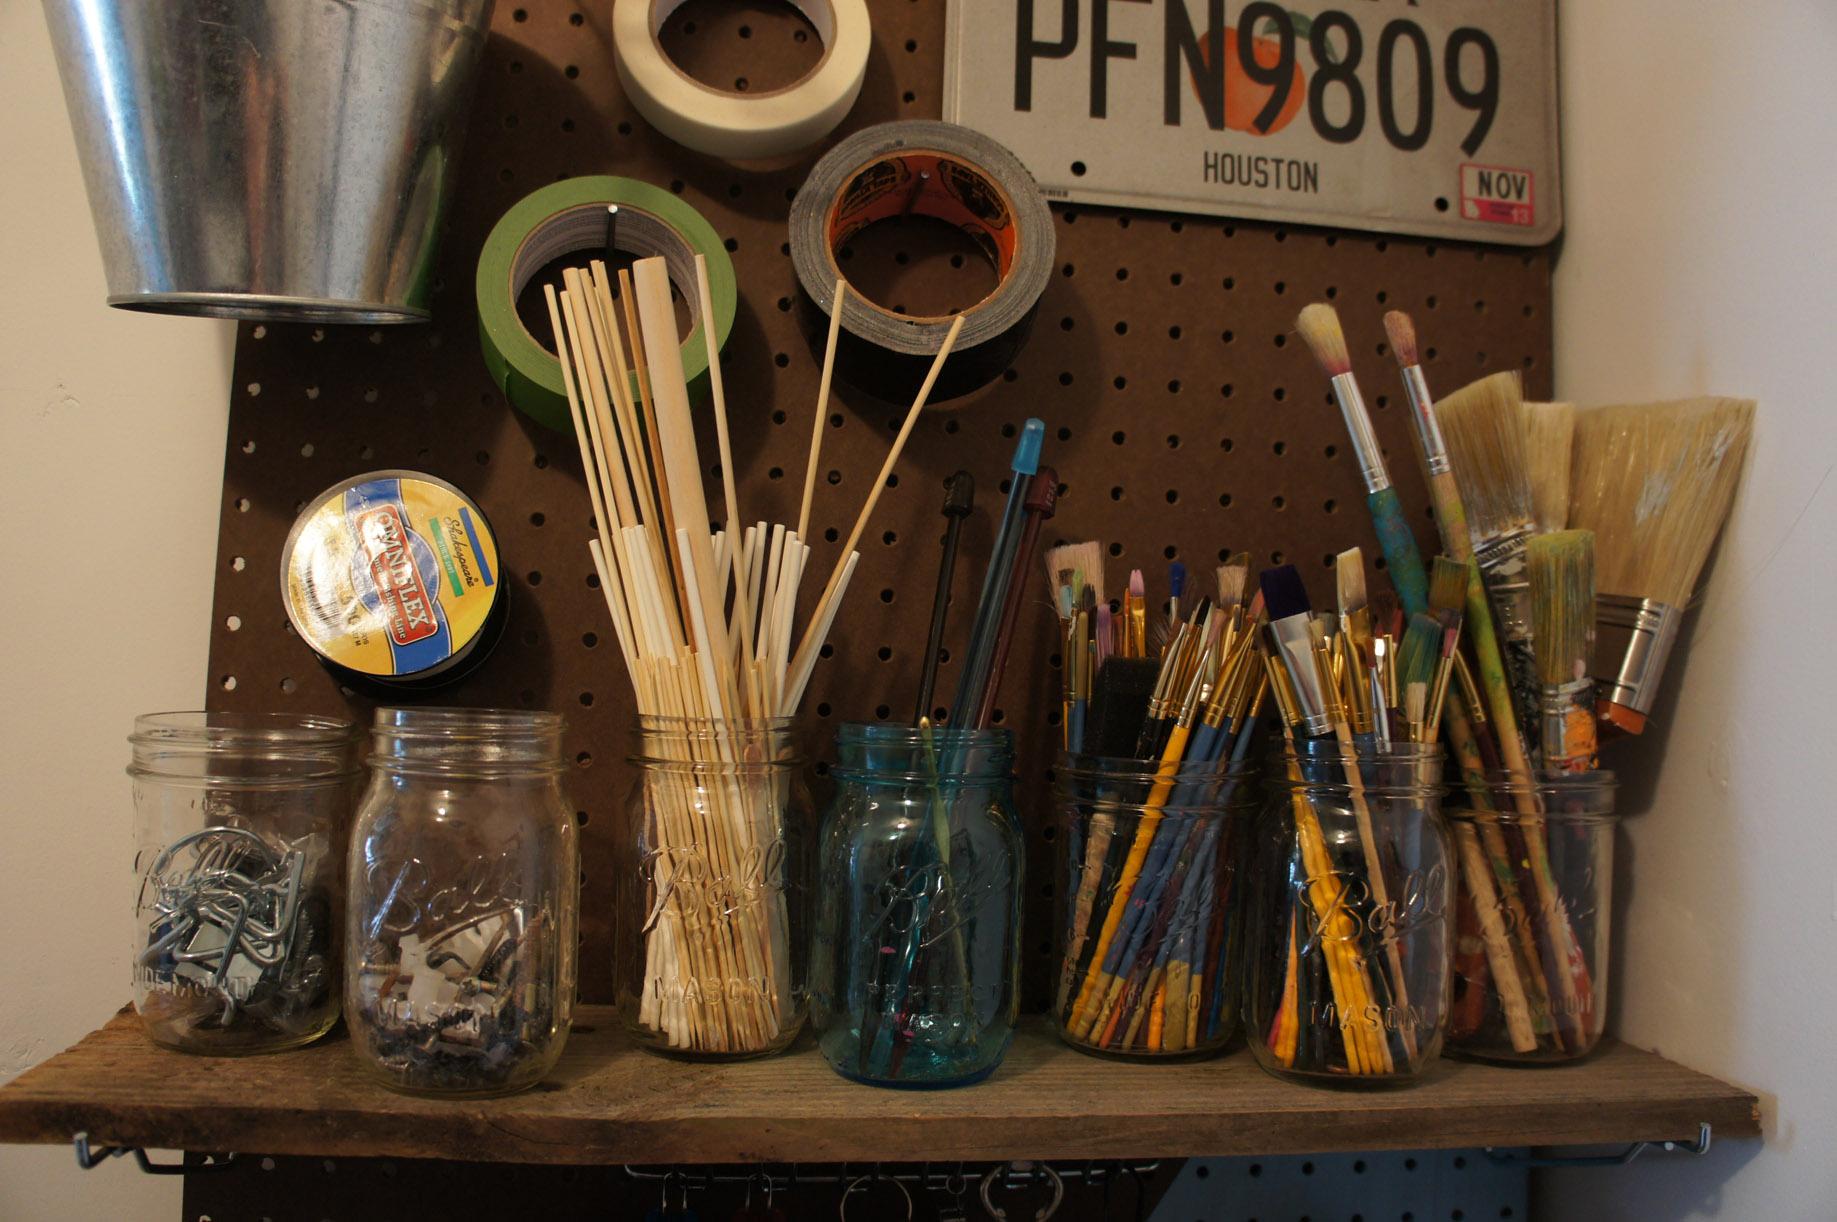 mason jars to organize